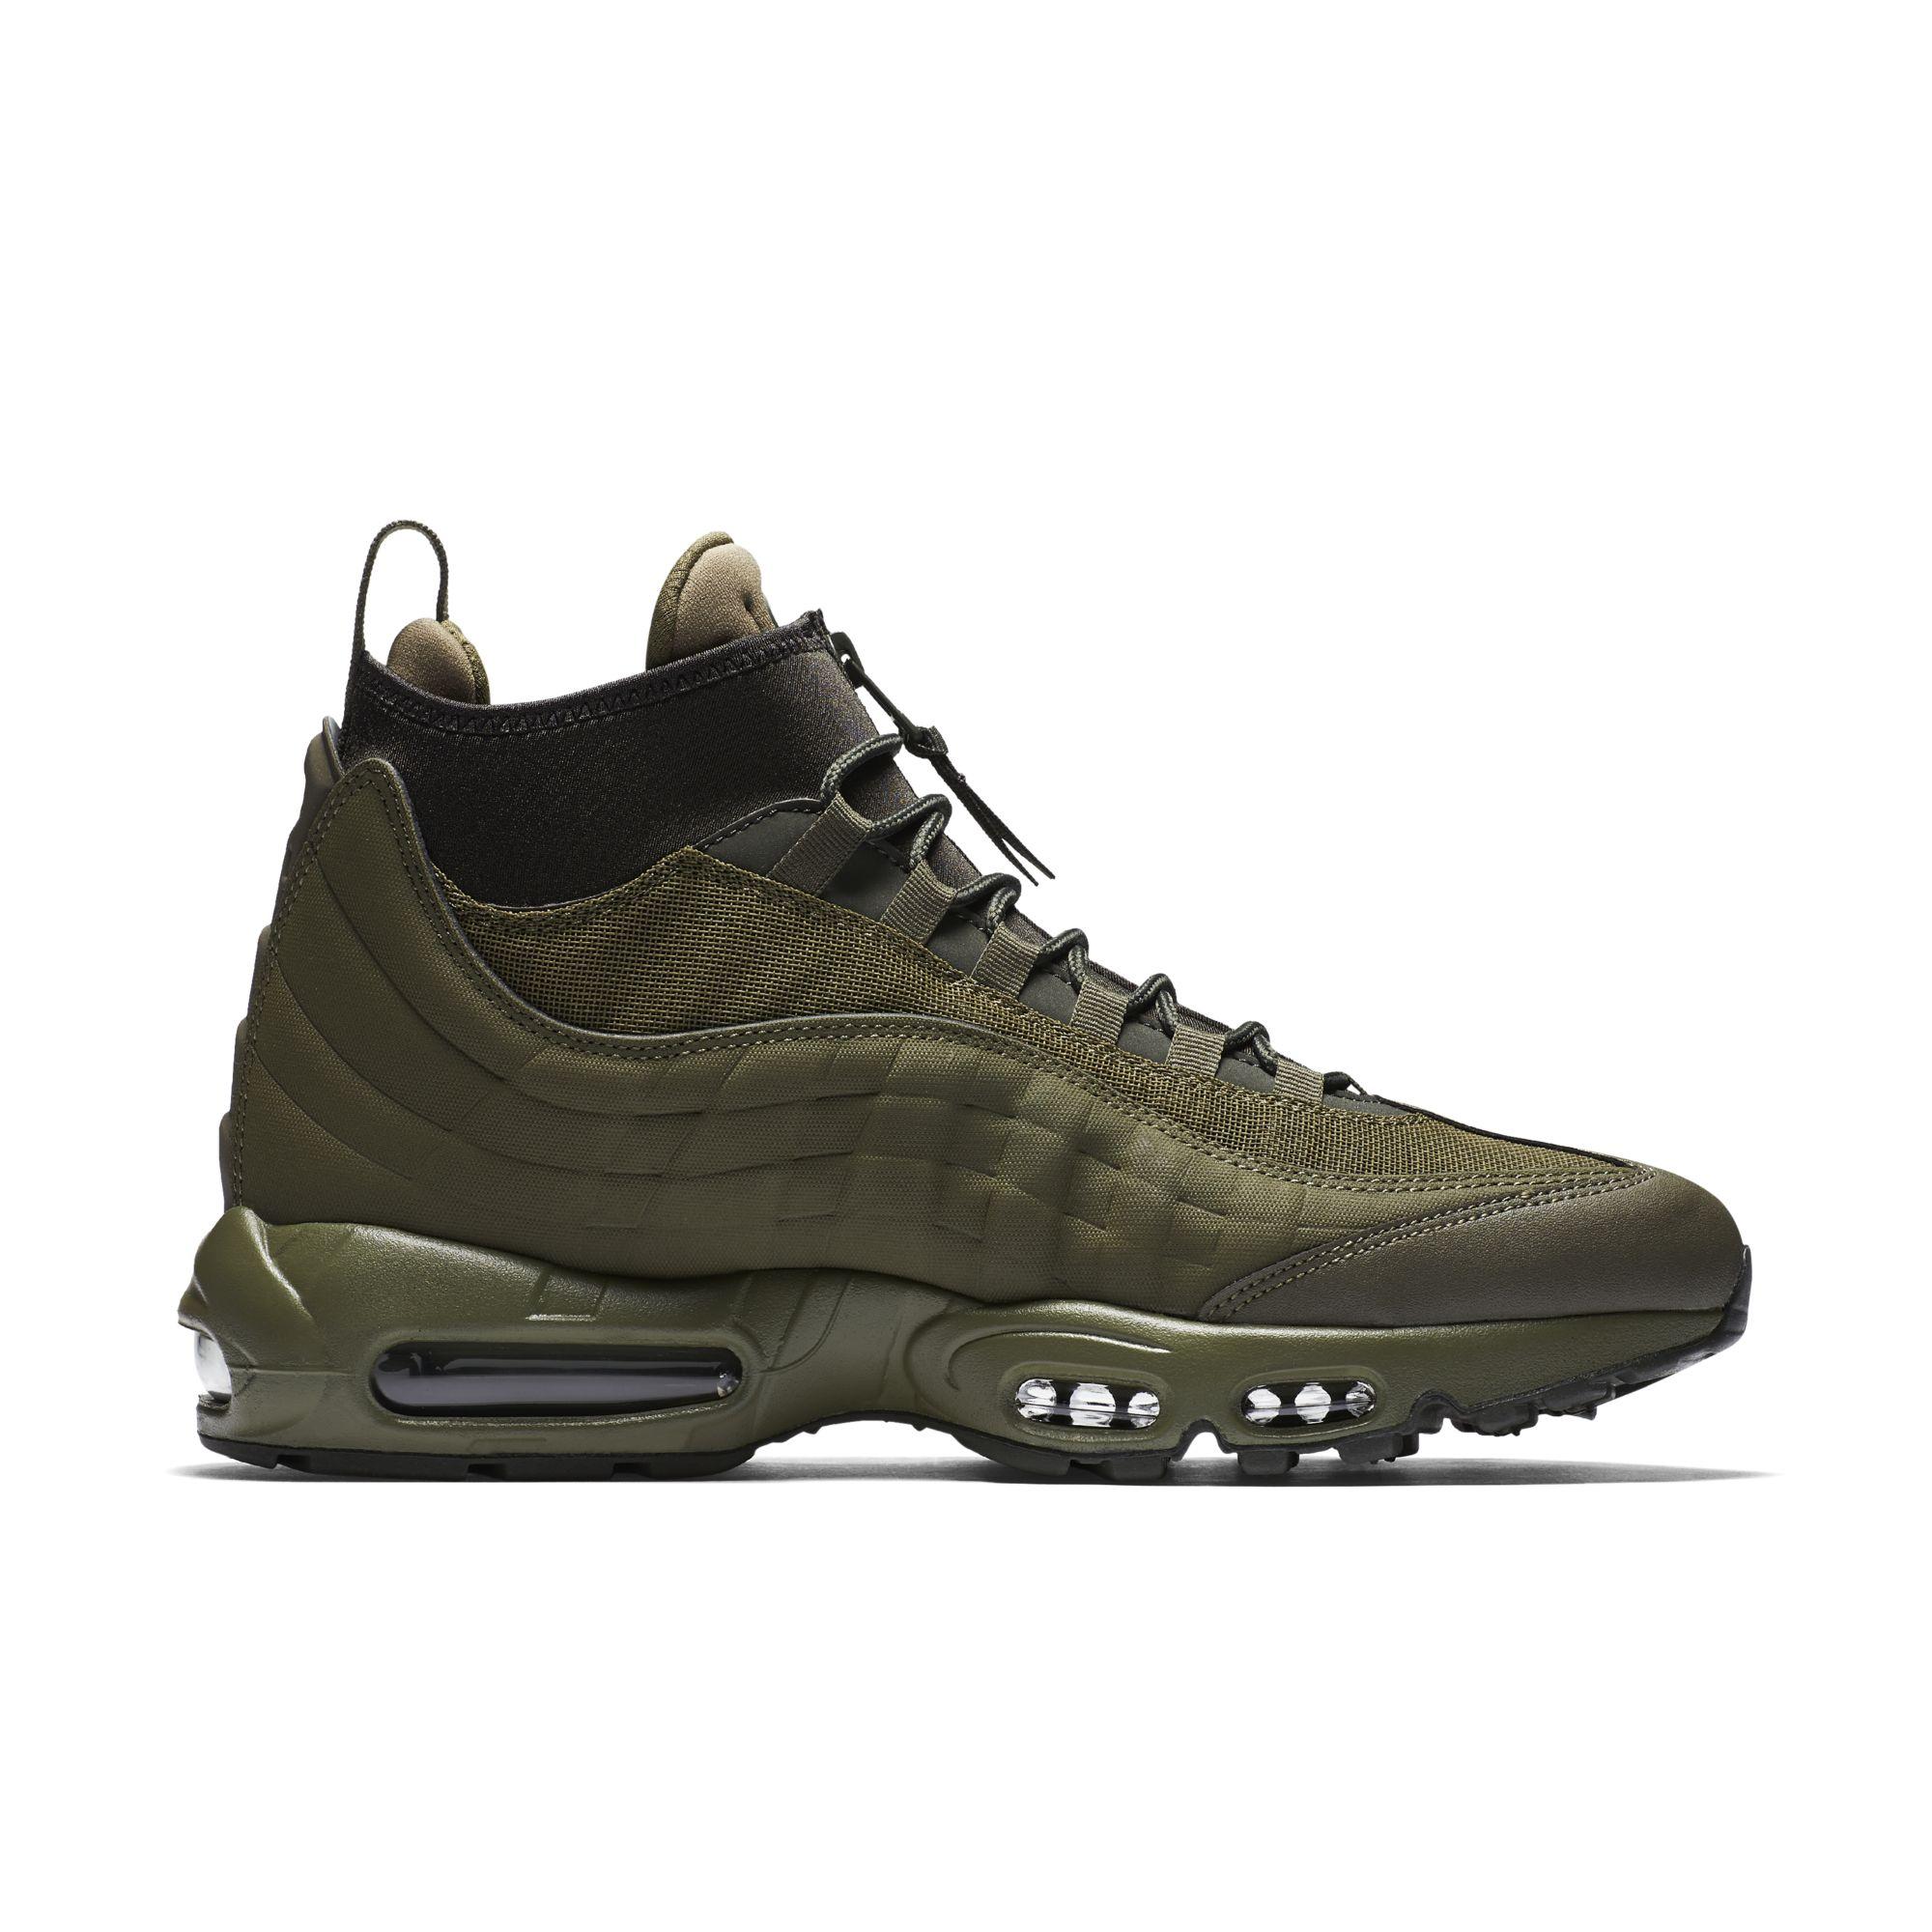 More Nike Air Max 95 Sneakerboots are Releasing   Nice Kicks